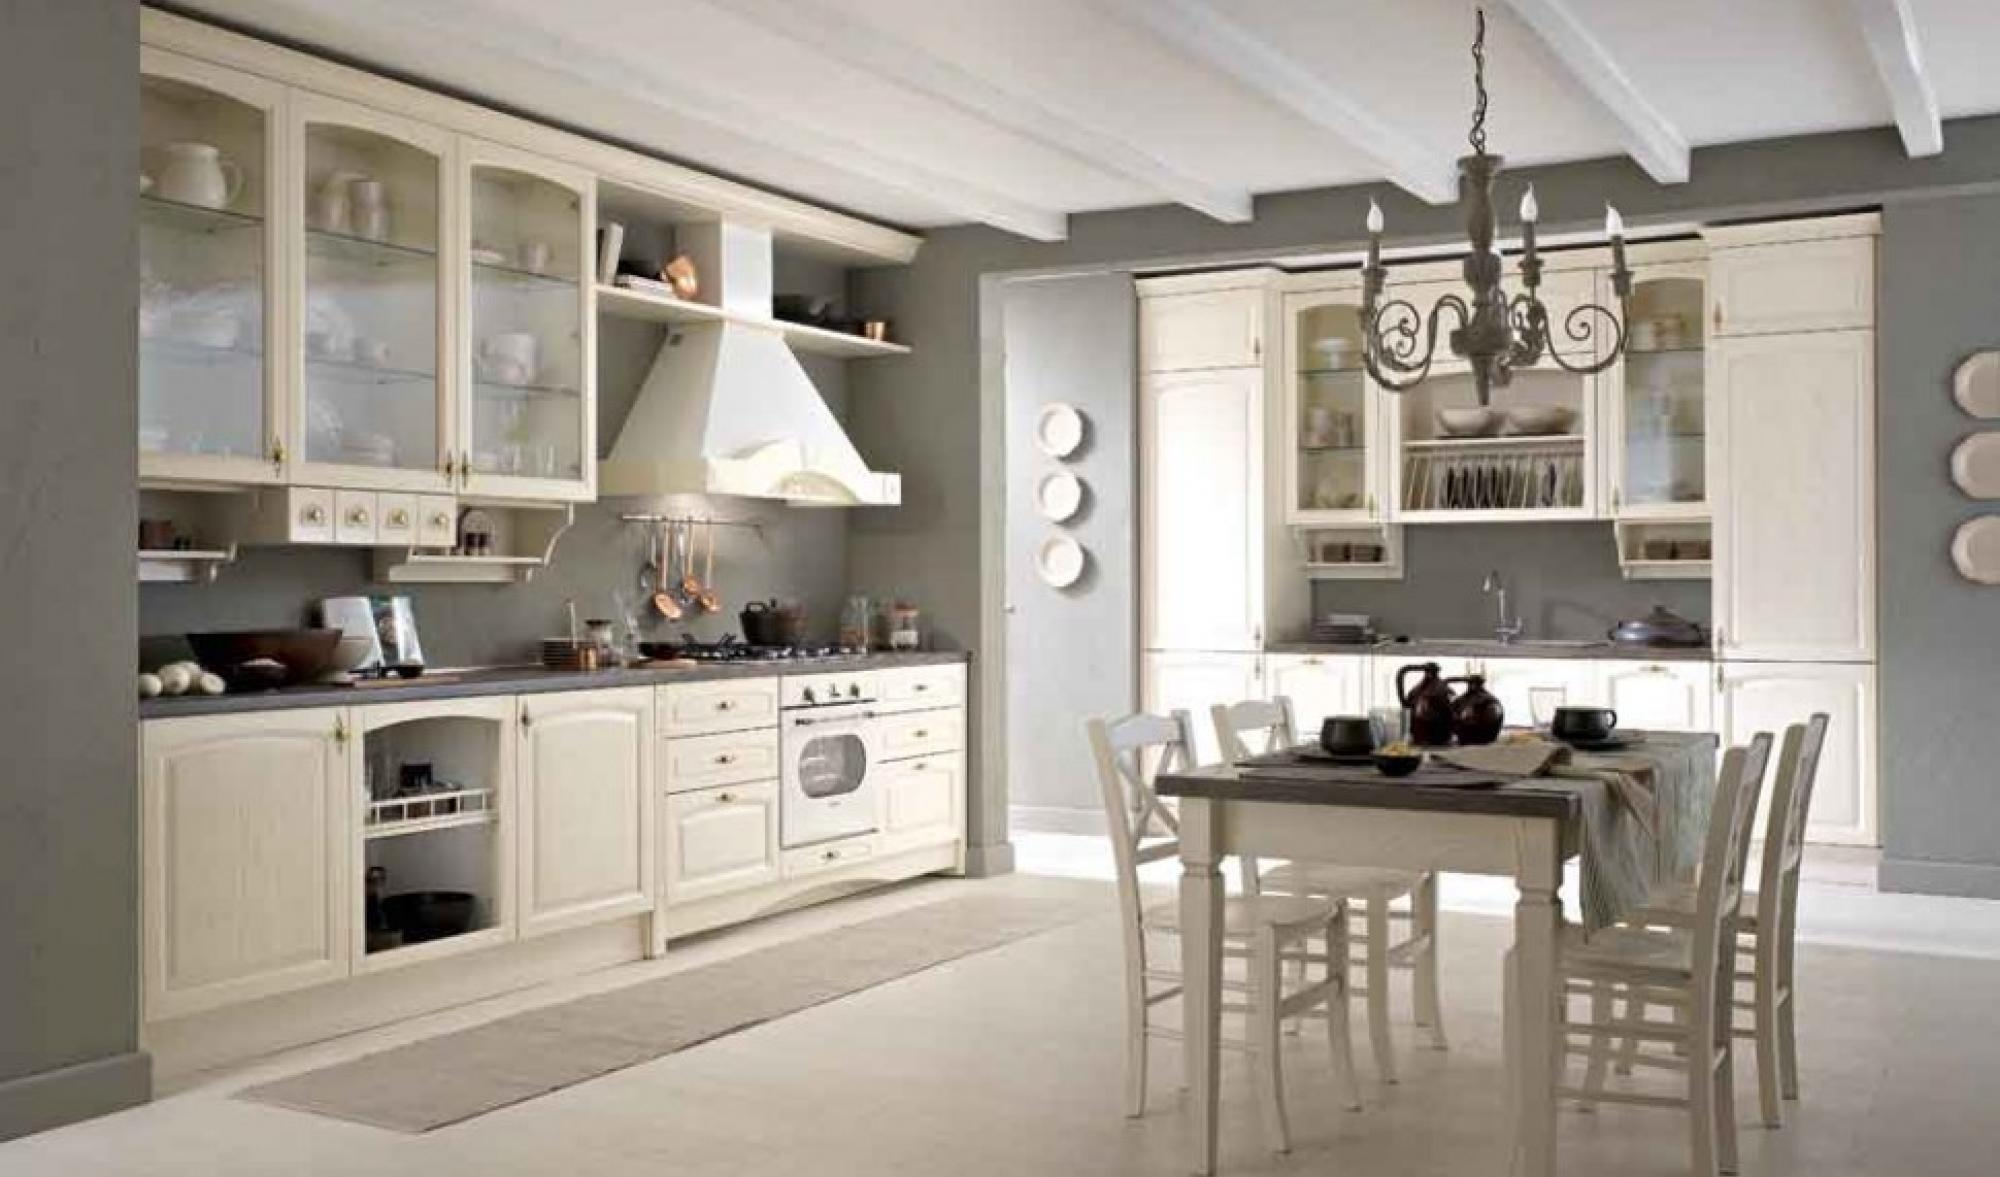 Stunning Cucine Artec Prezzi Photos - Ideas & Design 2017 ...